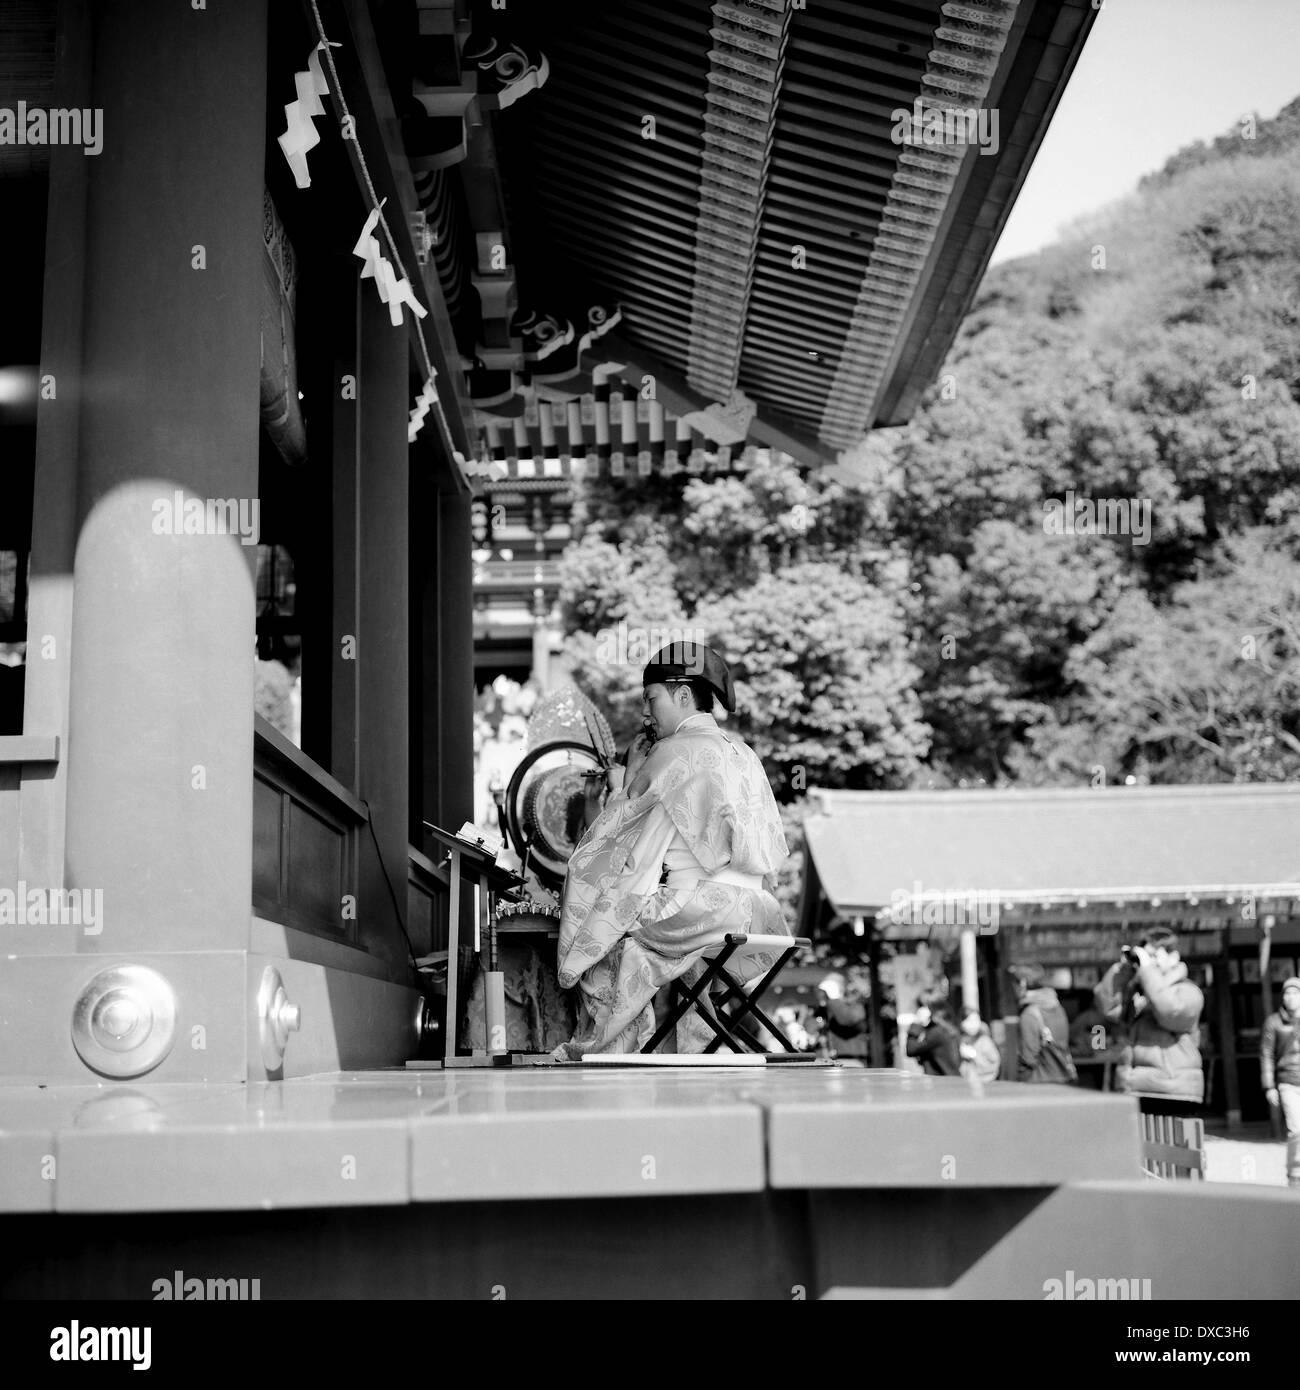 Flute Player In Kamakura, Kanagawa Prefecture, Japan - Stock Image